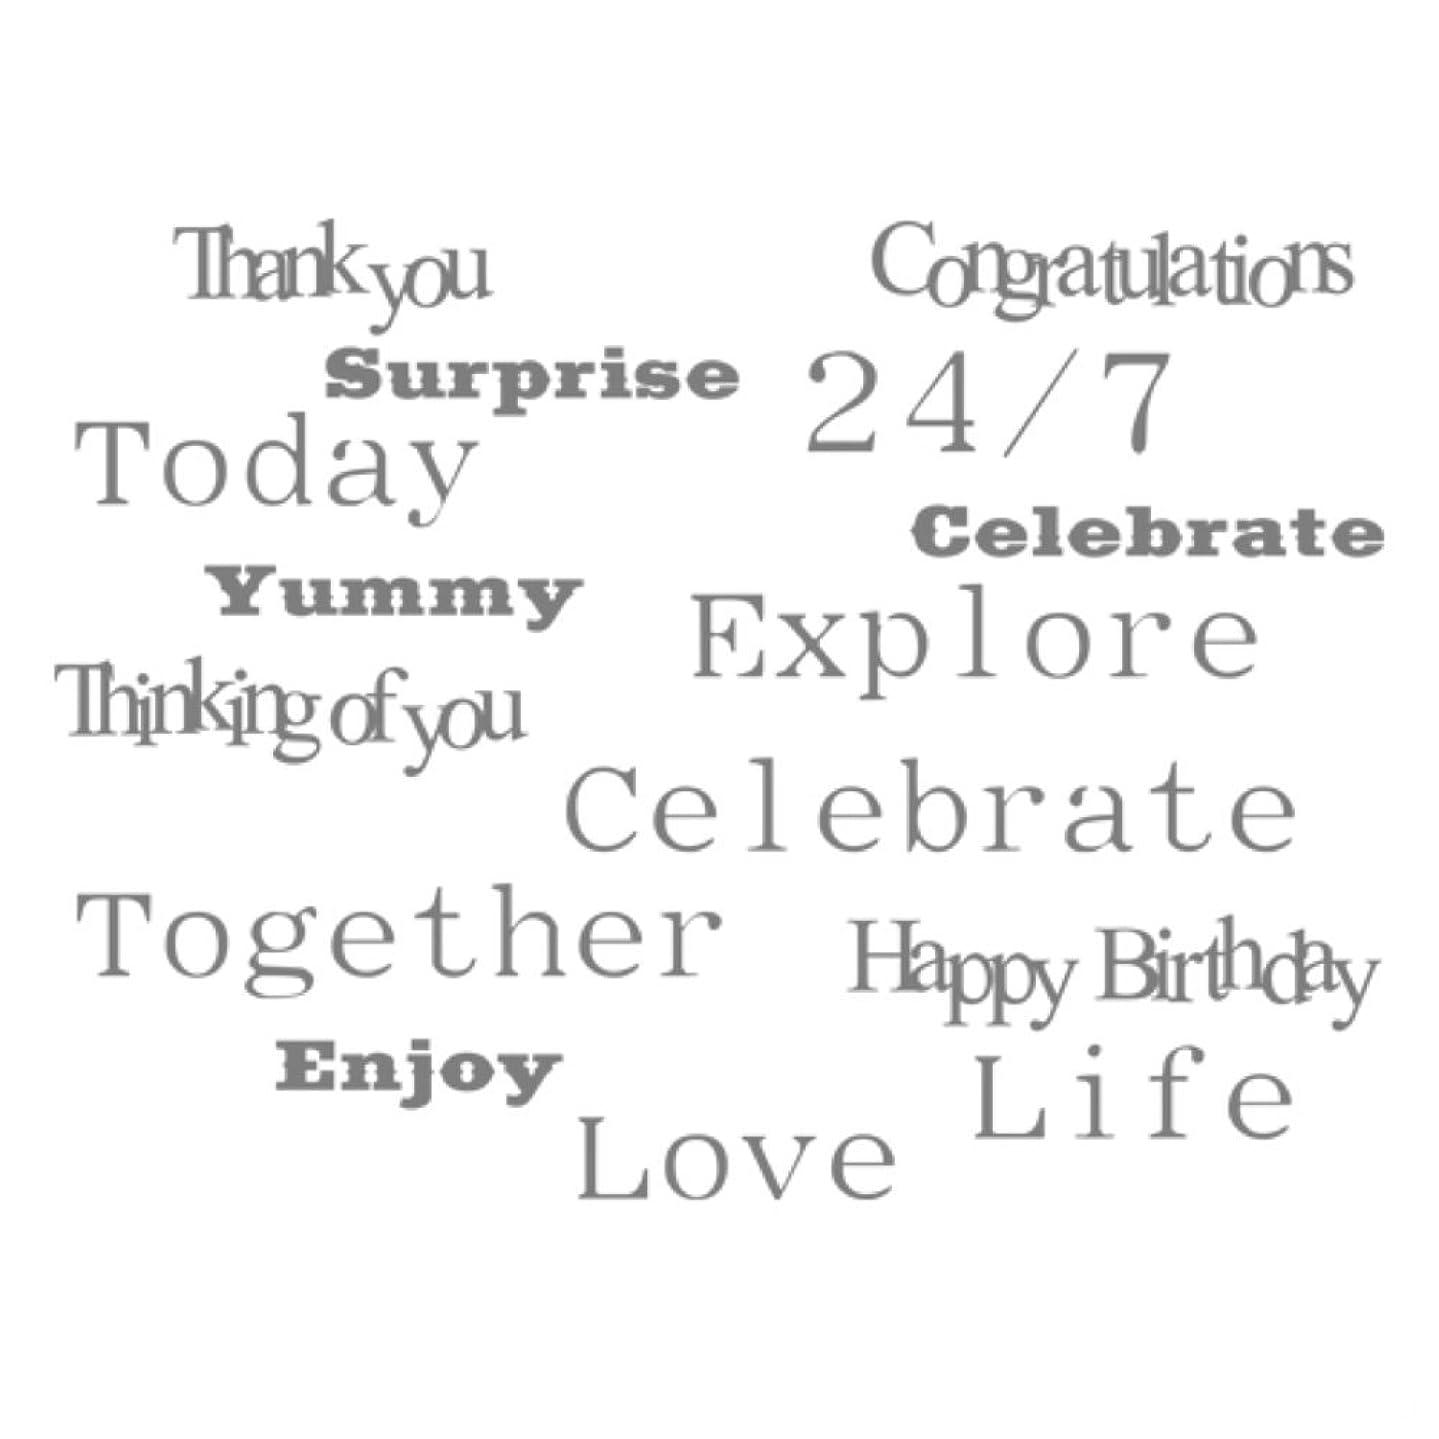 Spellbinders Celebrations Many Words Stamp Set